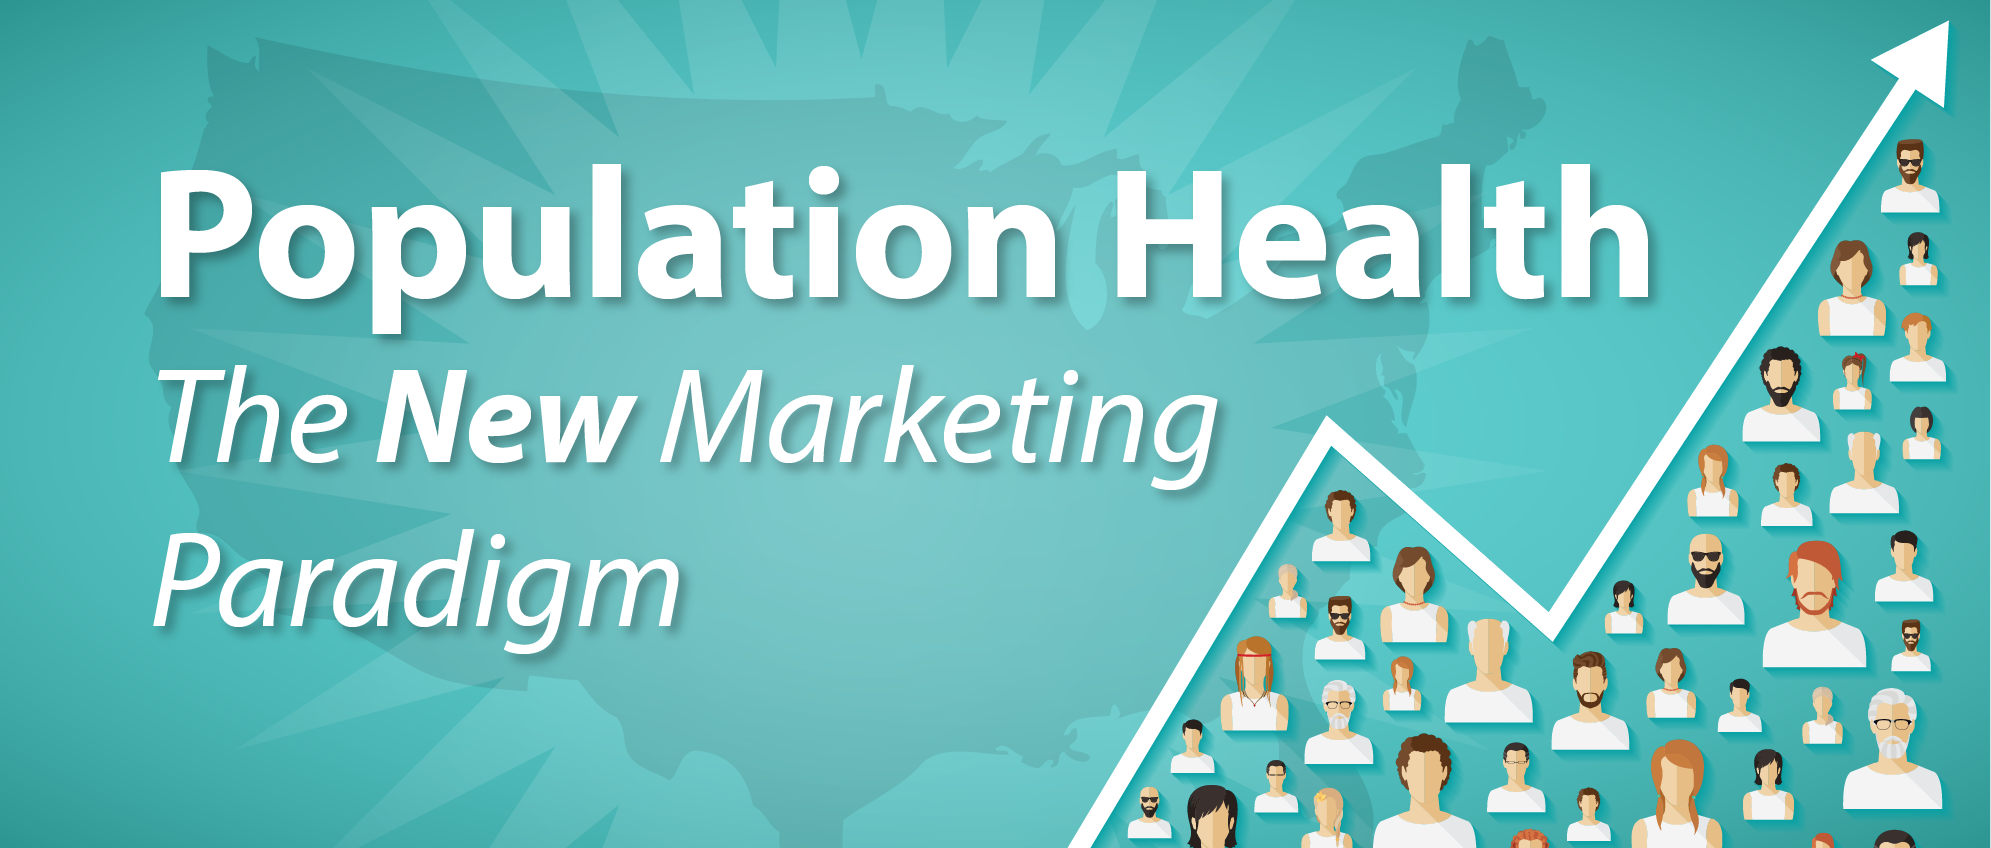 Population Health: The New Marketing Paradigm